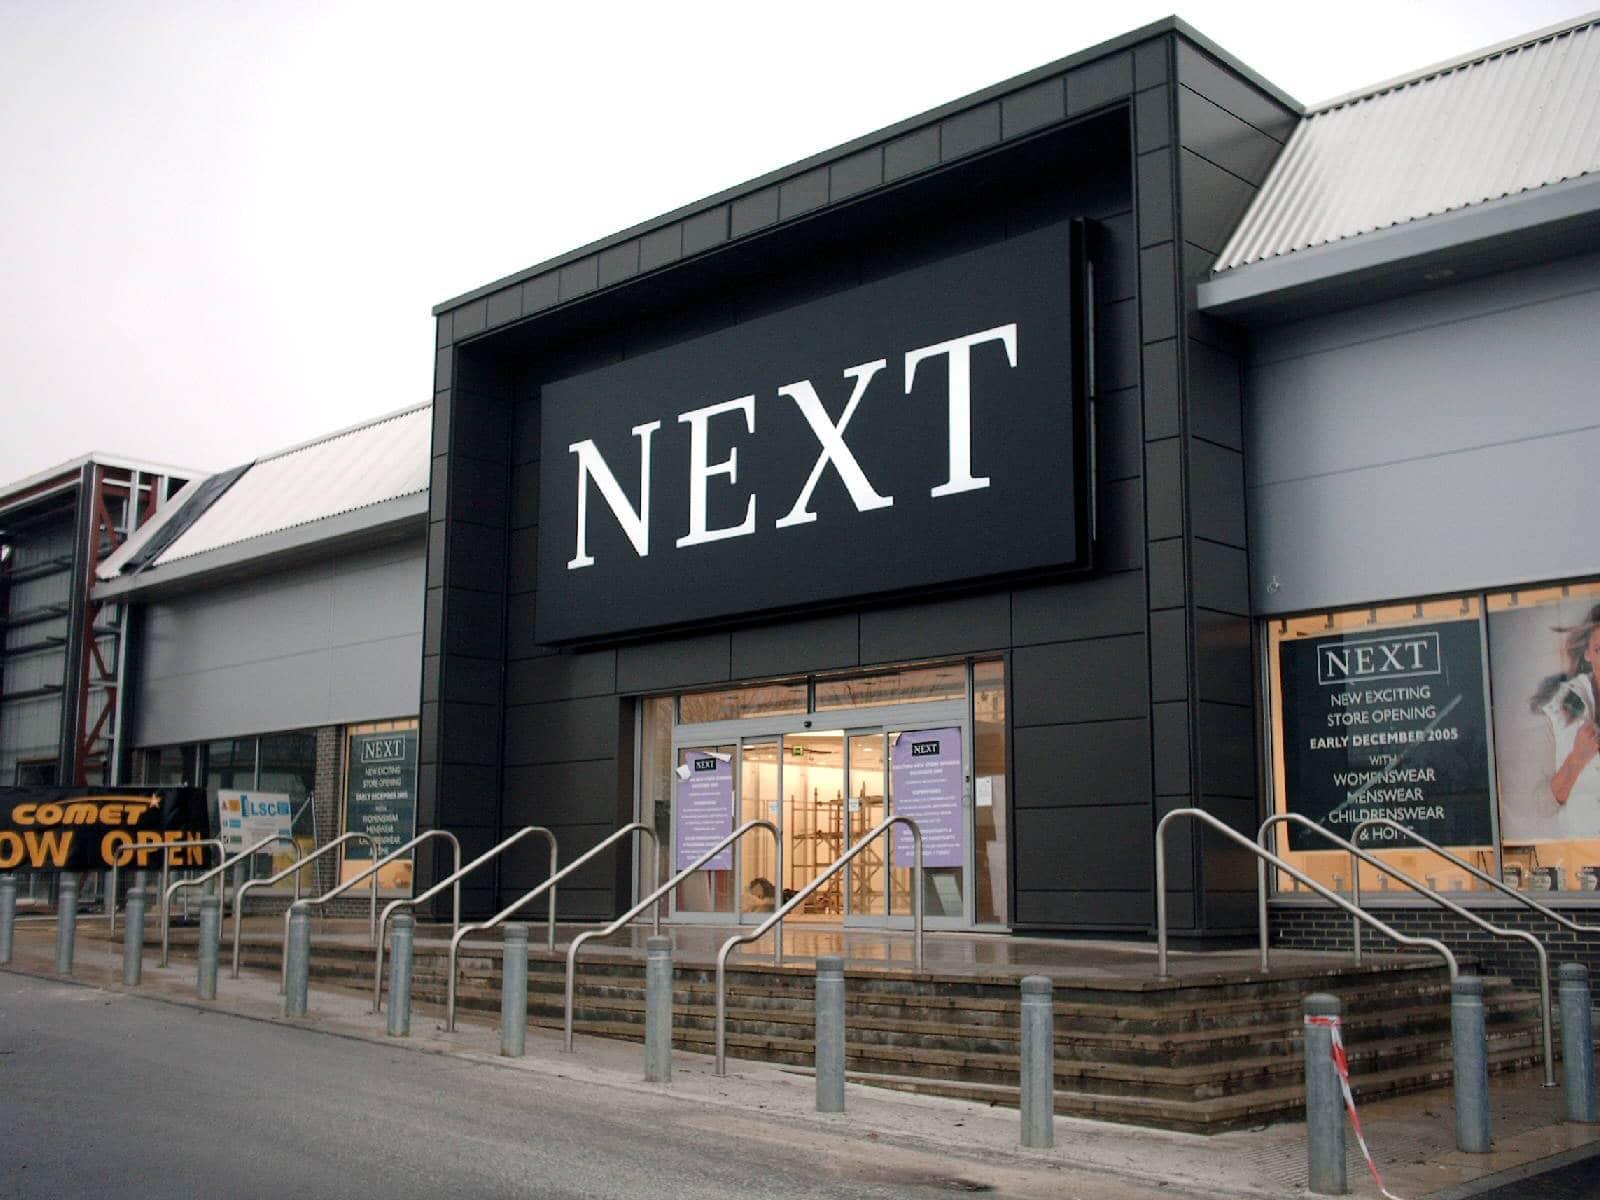 Centro-Comercial-County-Oak-retail.-Crawley-UK_1545900556.jpg